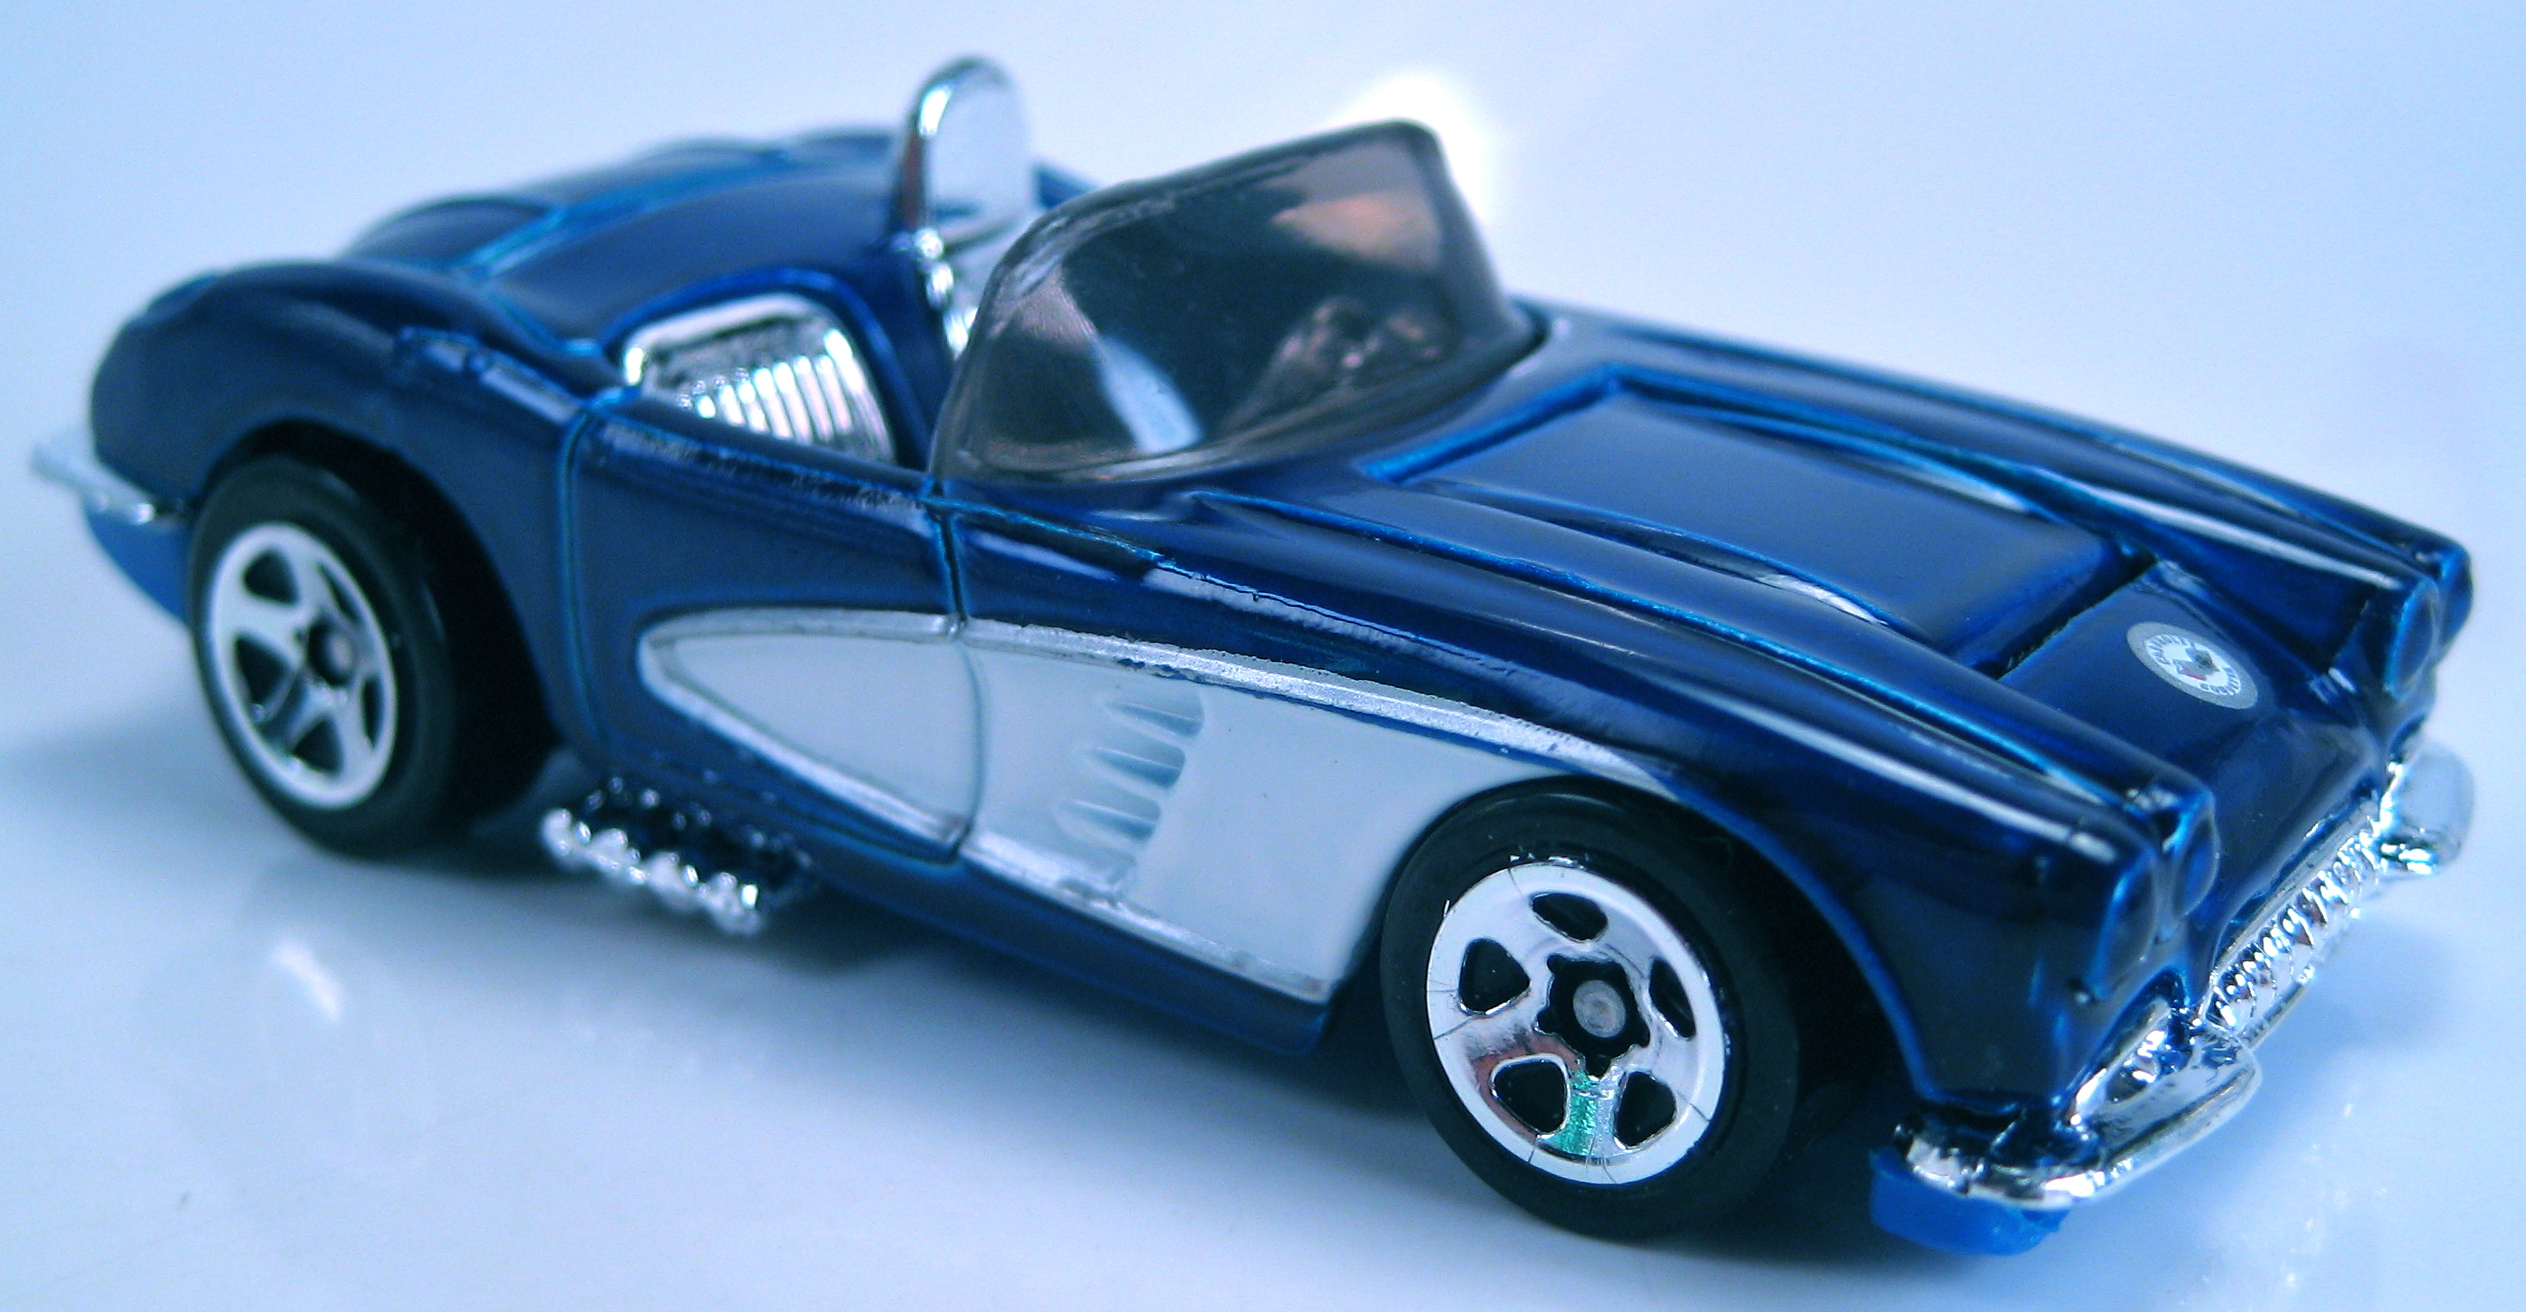 Corvette 60th Anniversary Series (2013)